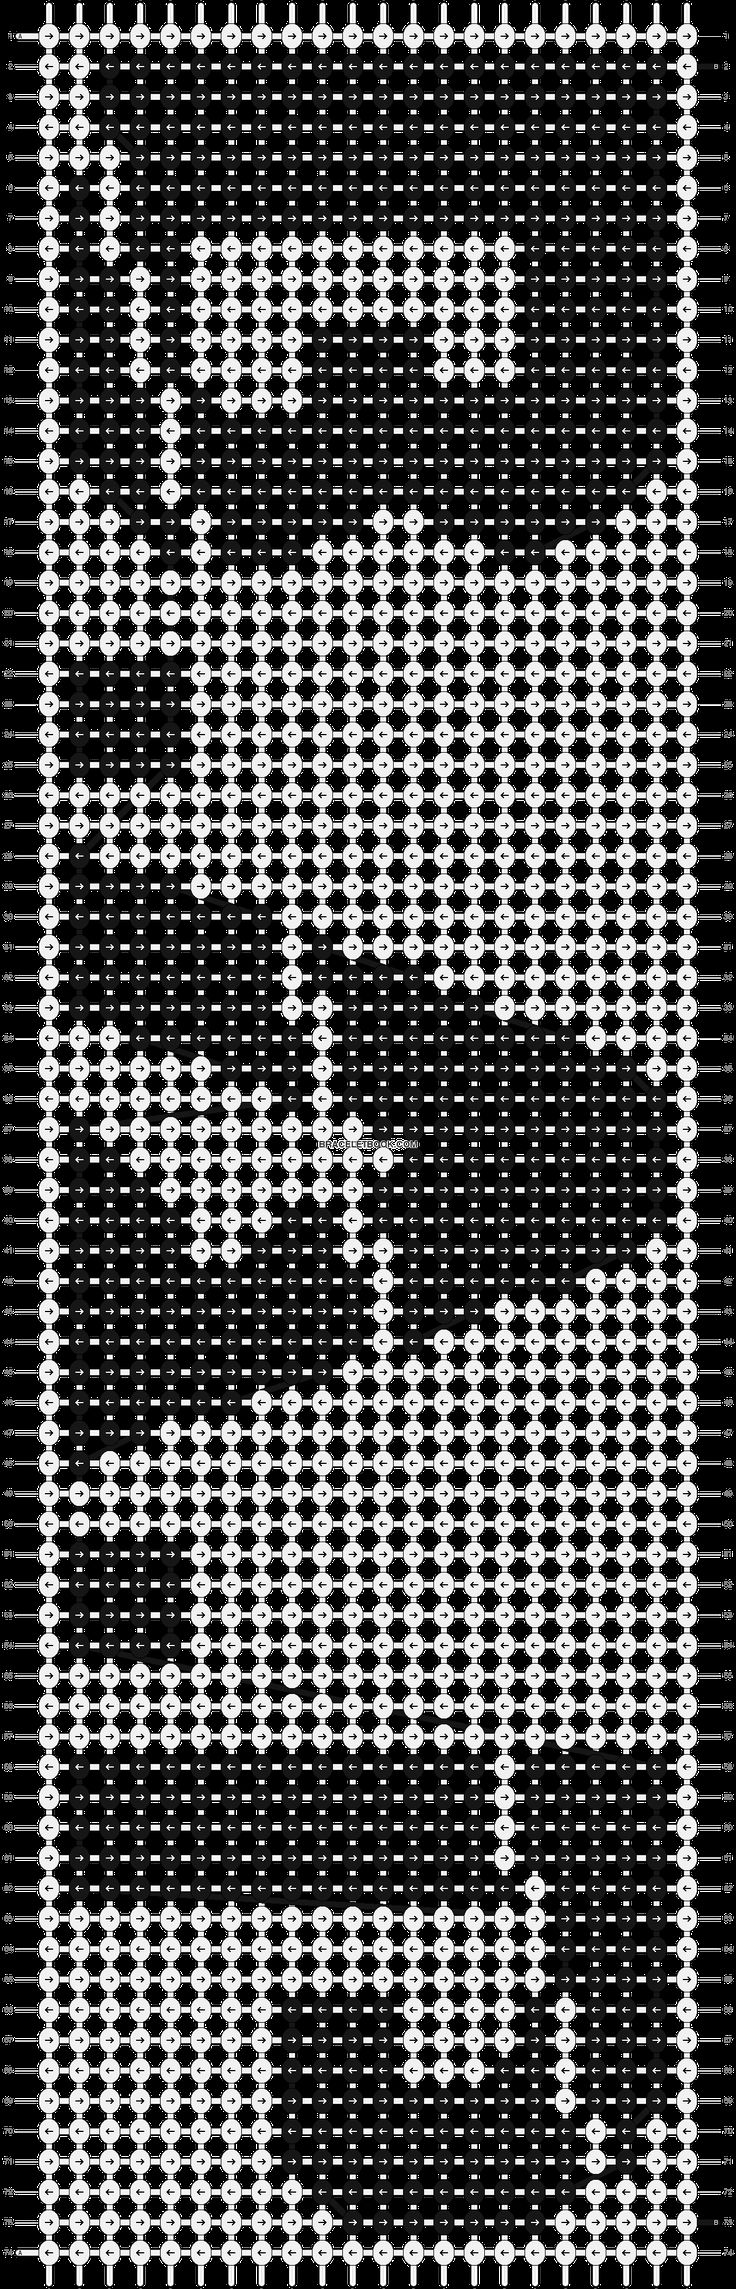 Alpha Pattern #6468 added by Nickistar KPOP!